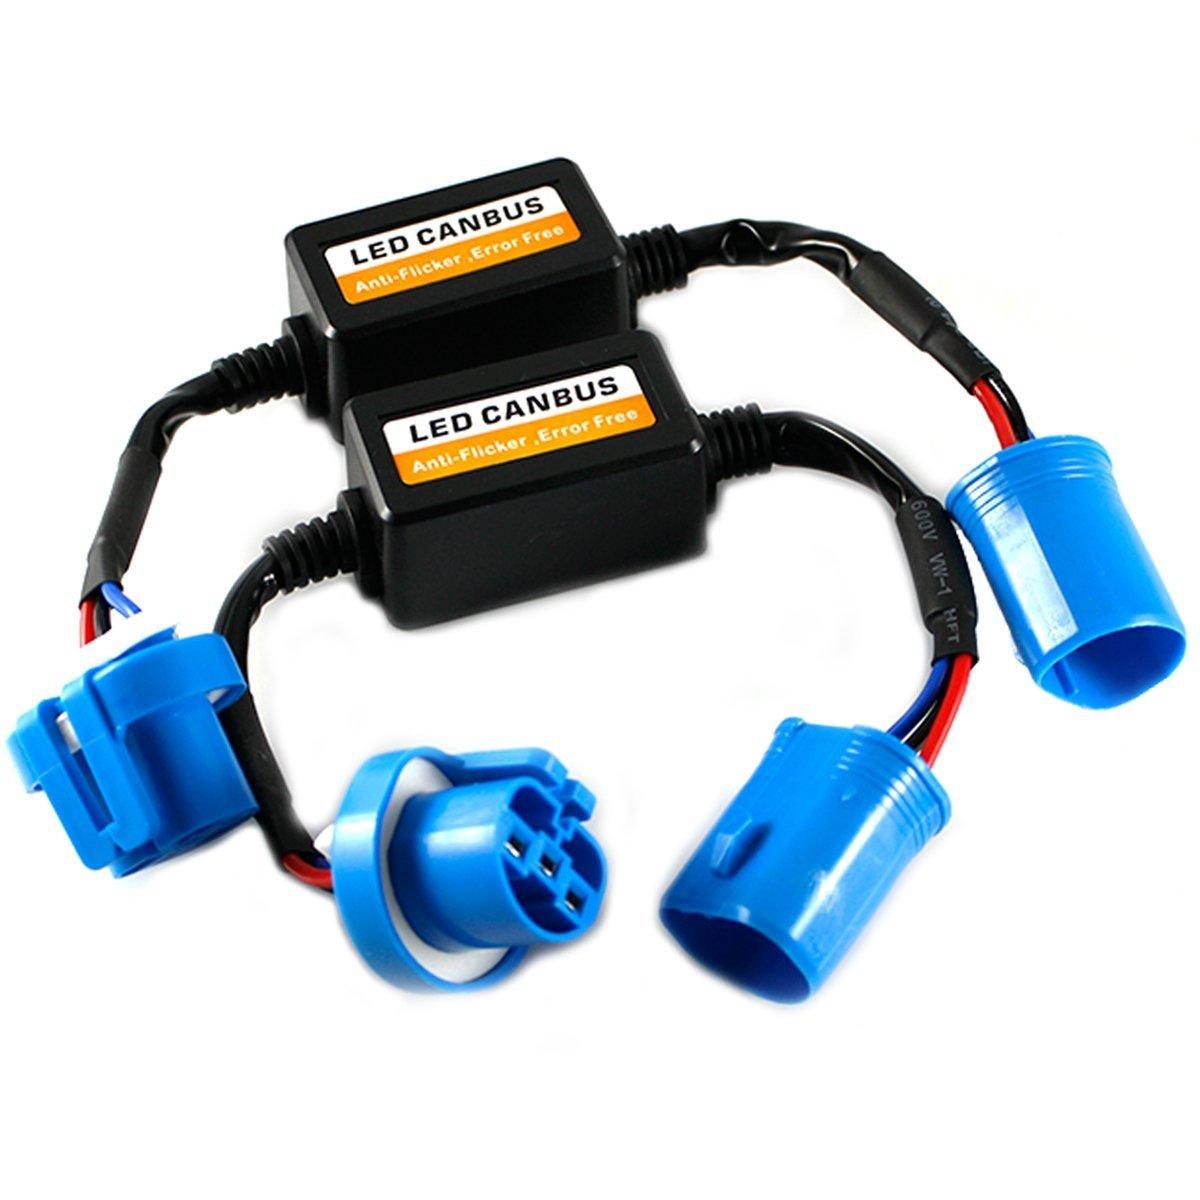 Treedeng Canbus EMC Warning Error Free Decoder Canceller Capacitor Anti-flicker Resistor harness for LED Headlights (9005/9006)